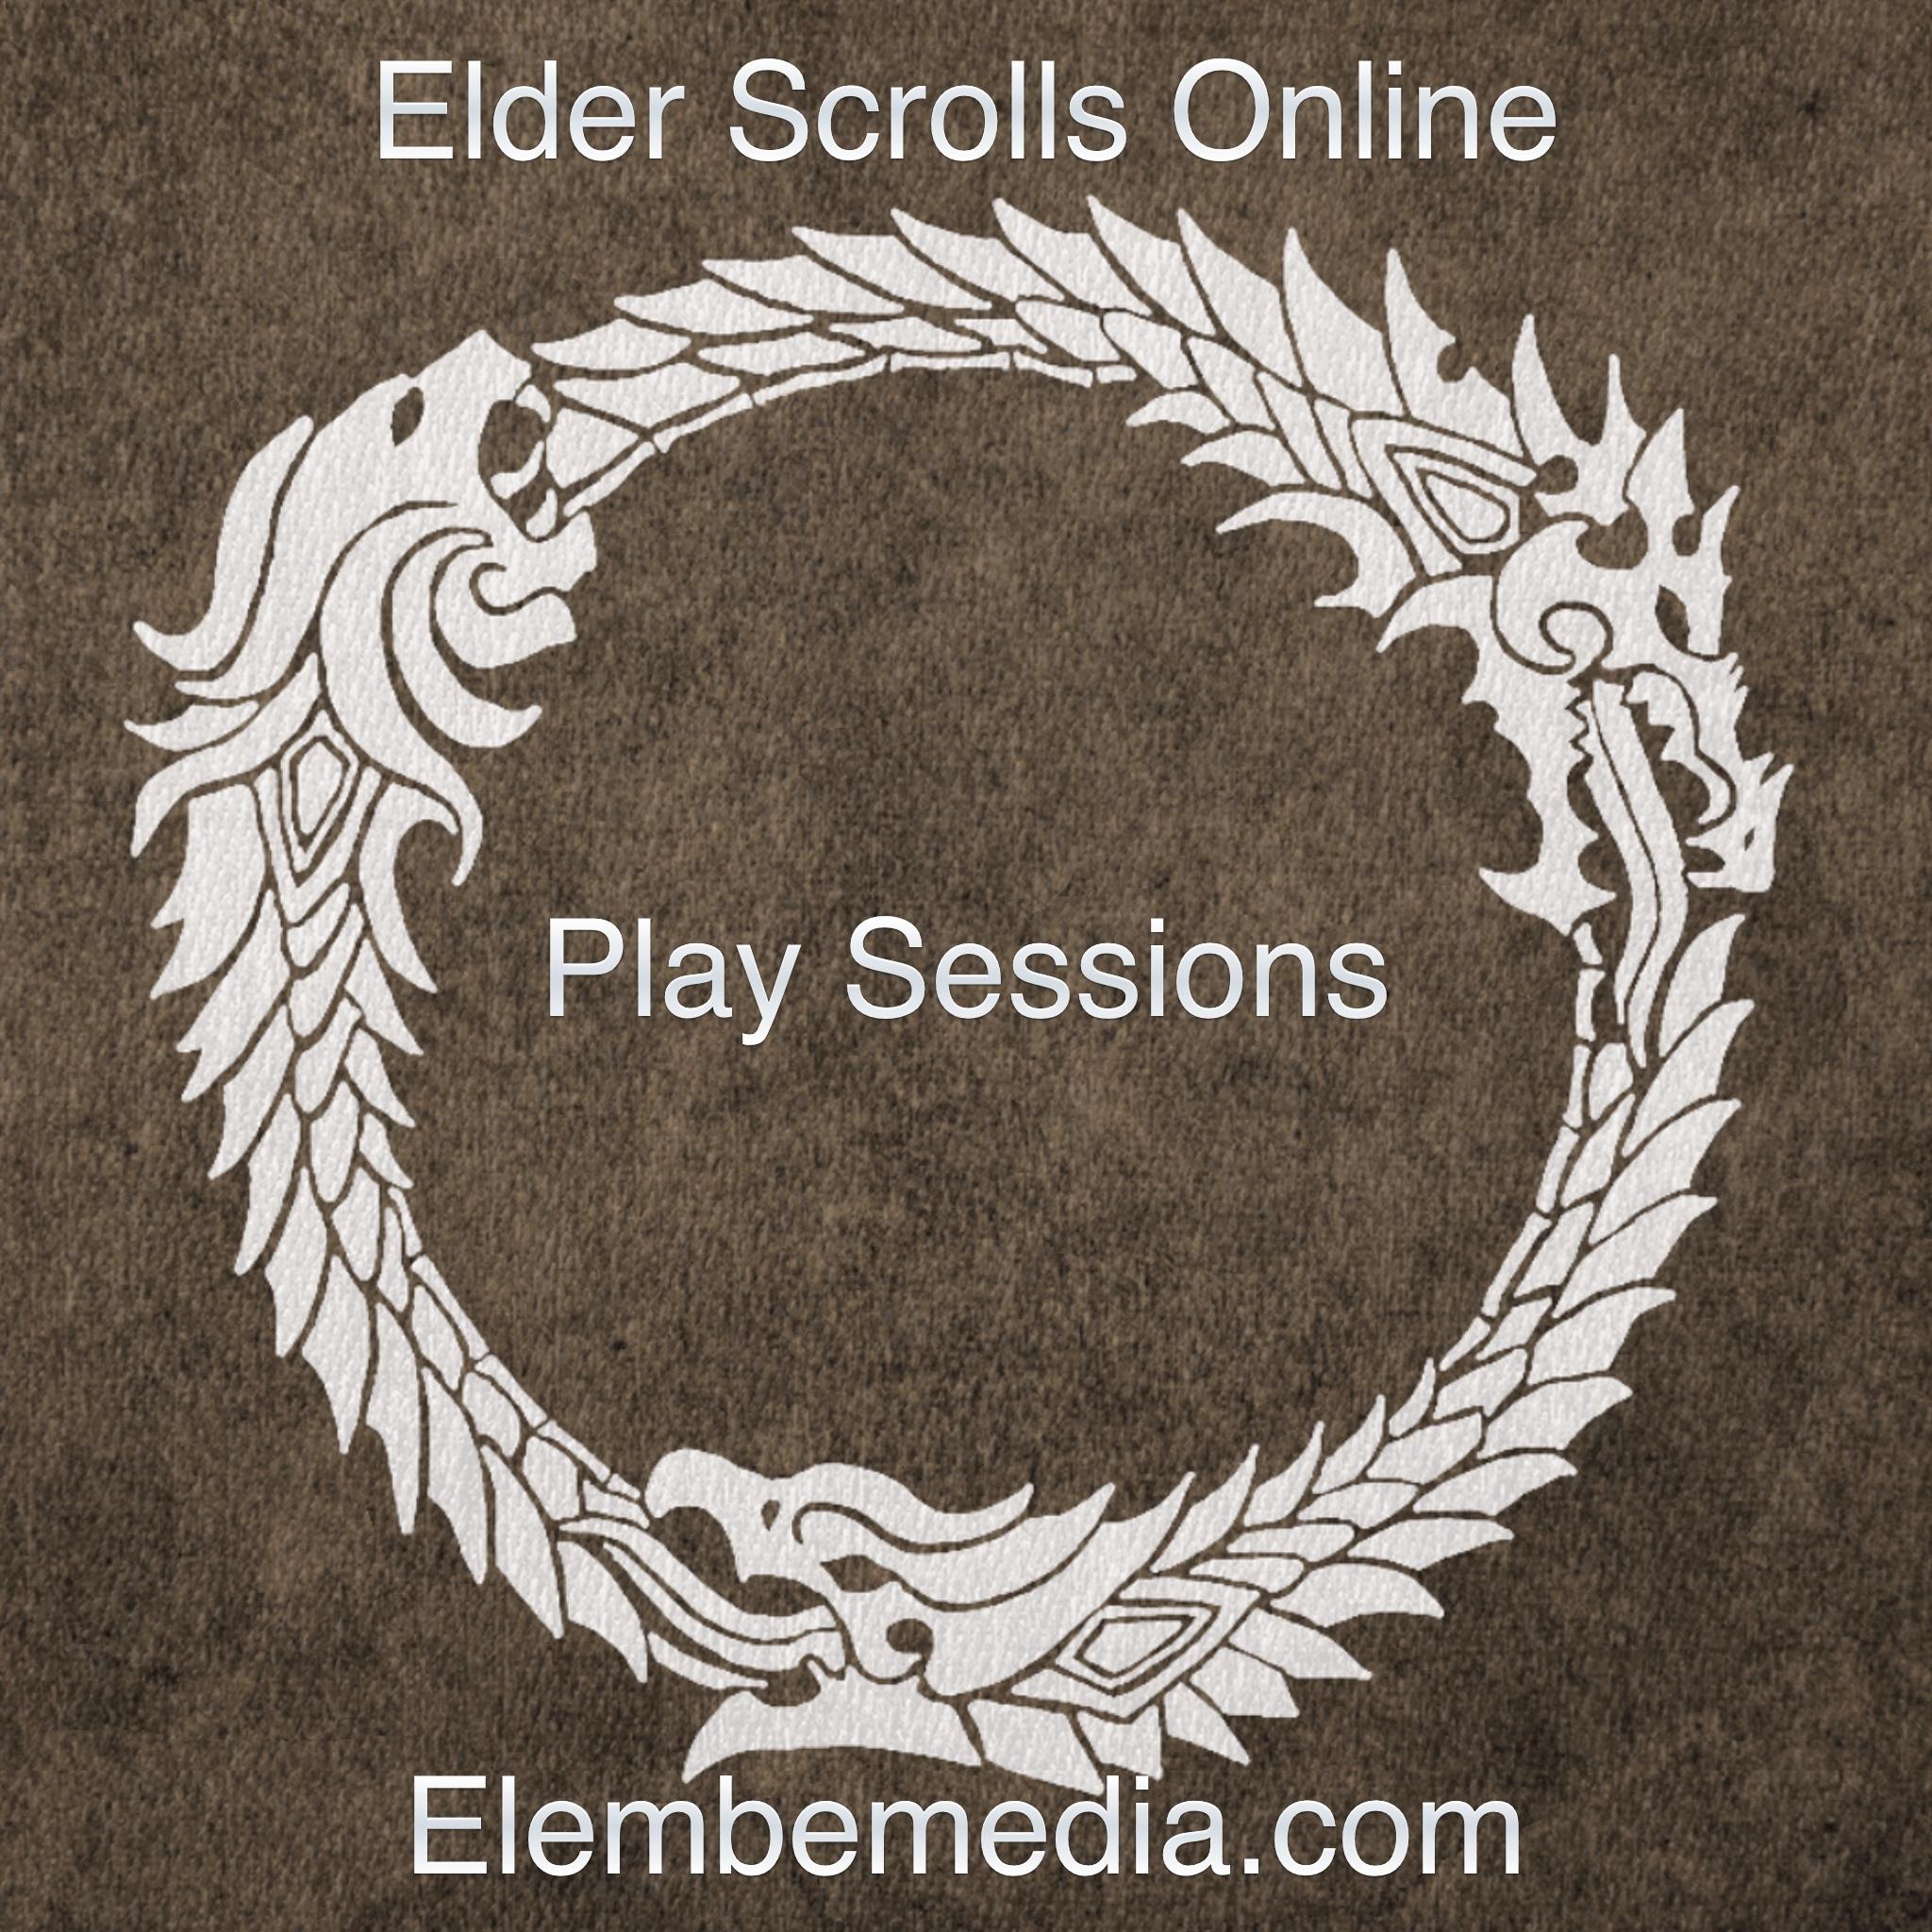 Elder Scrolls Online Play Sessions